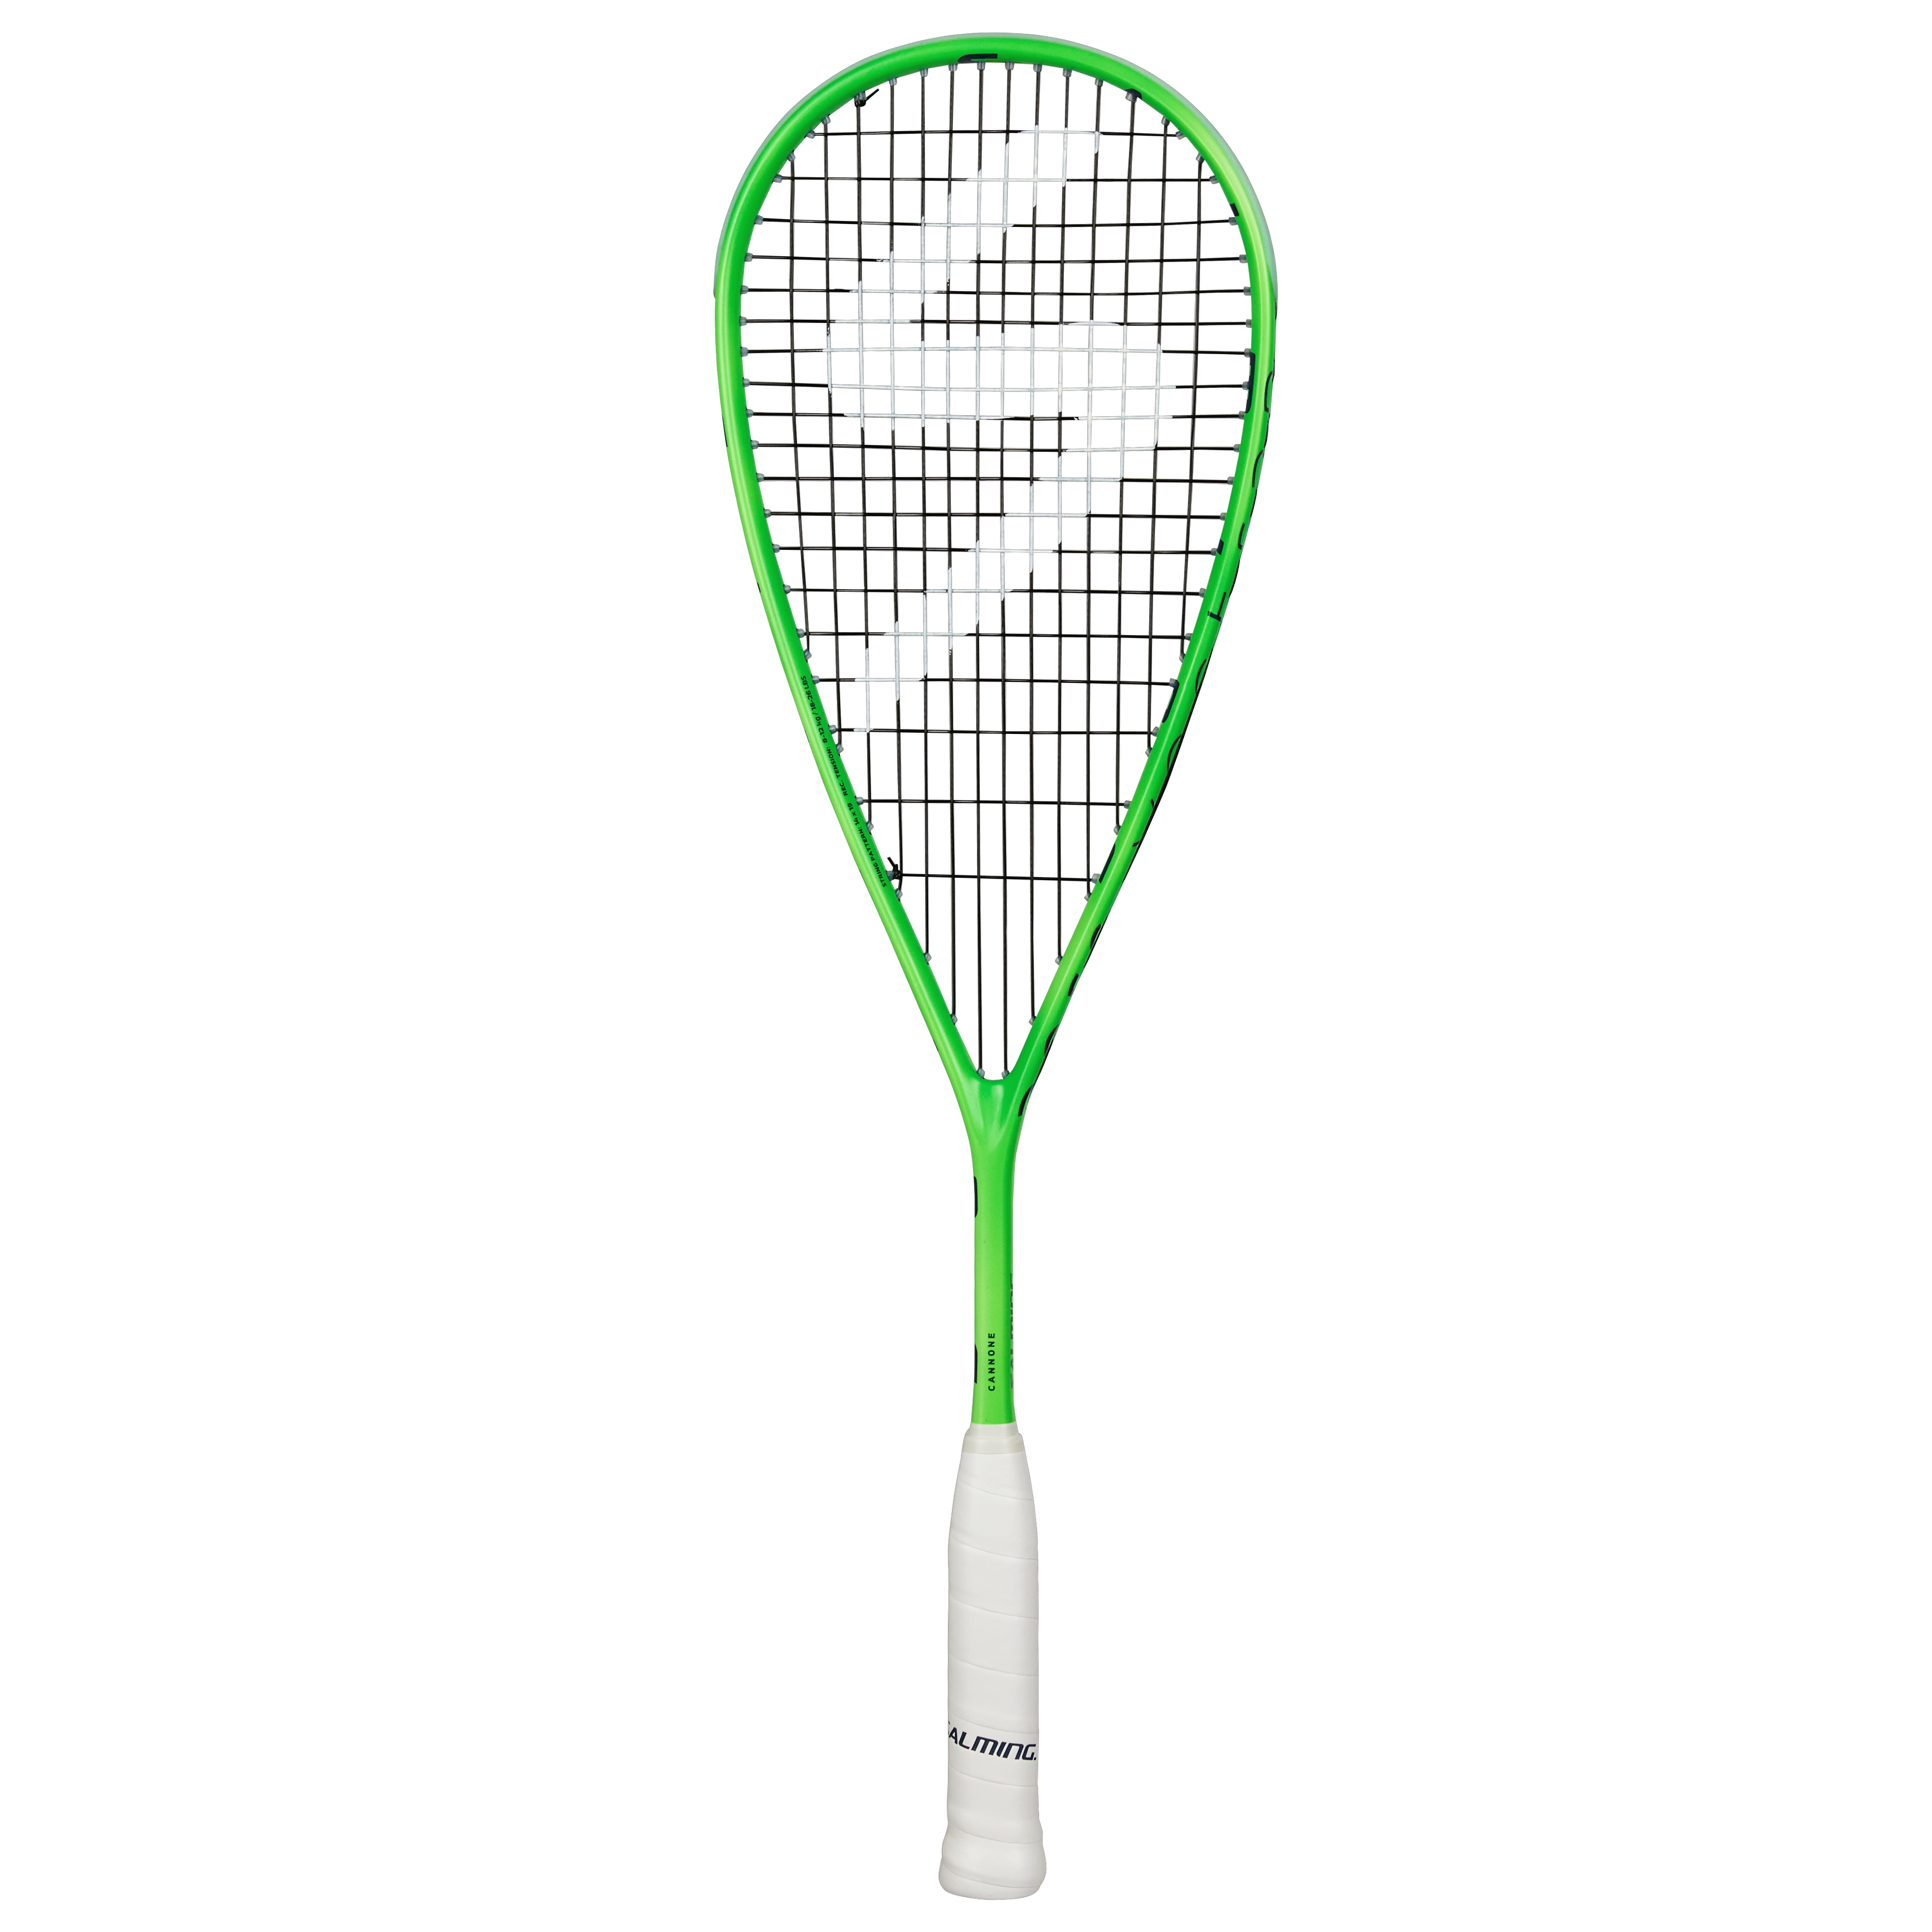 Salming Cannone Squash Racquet